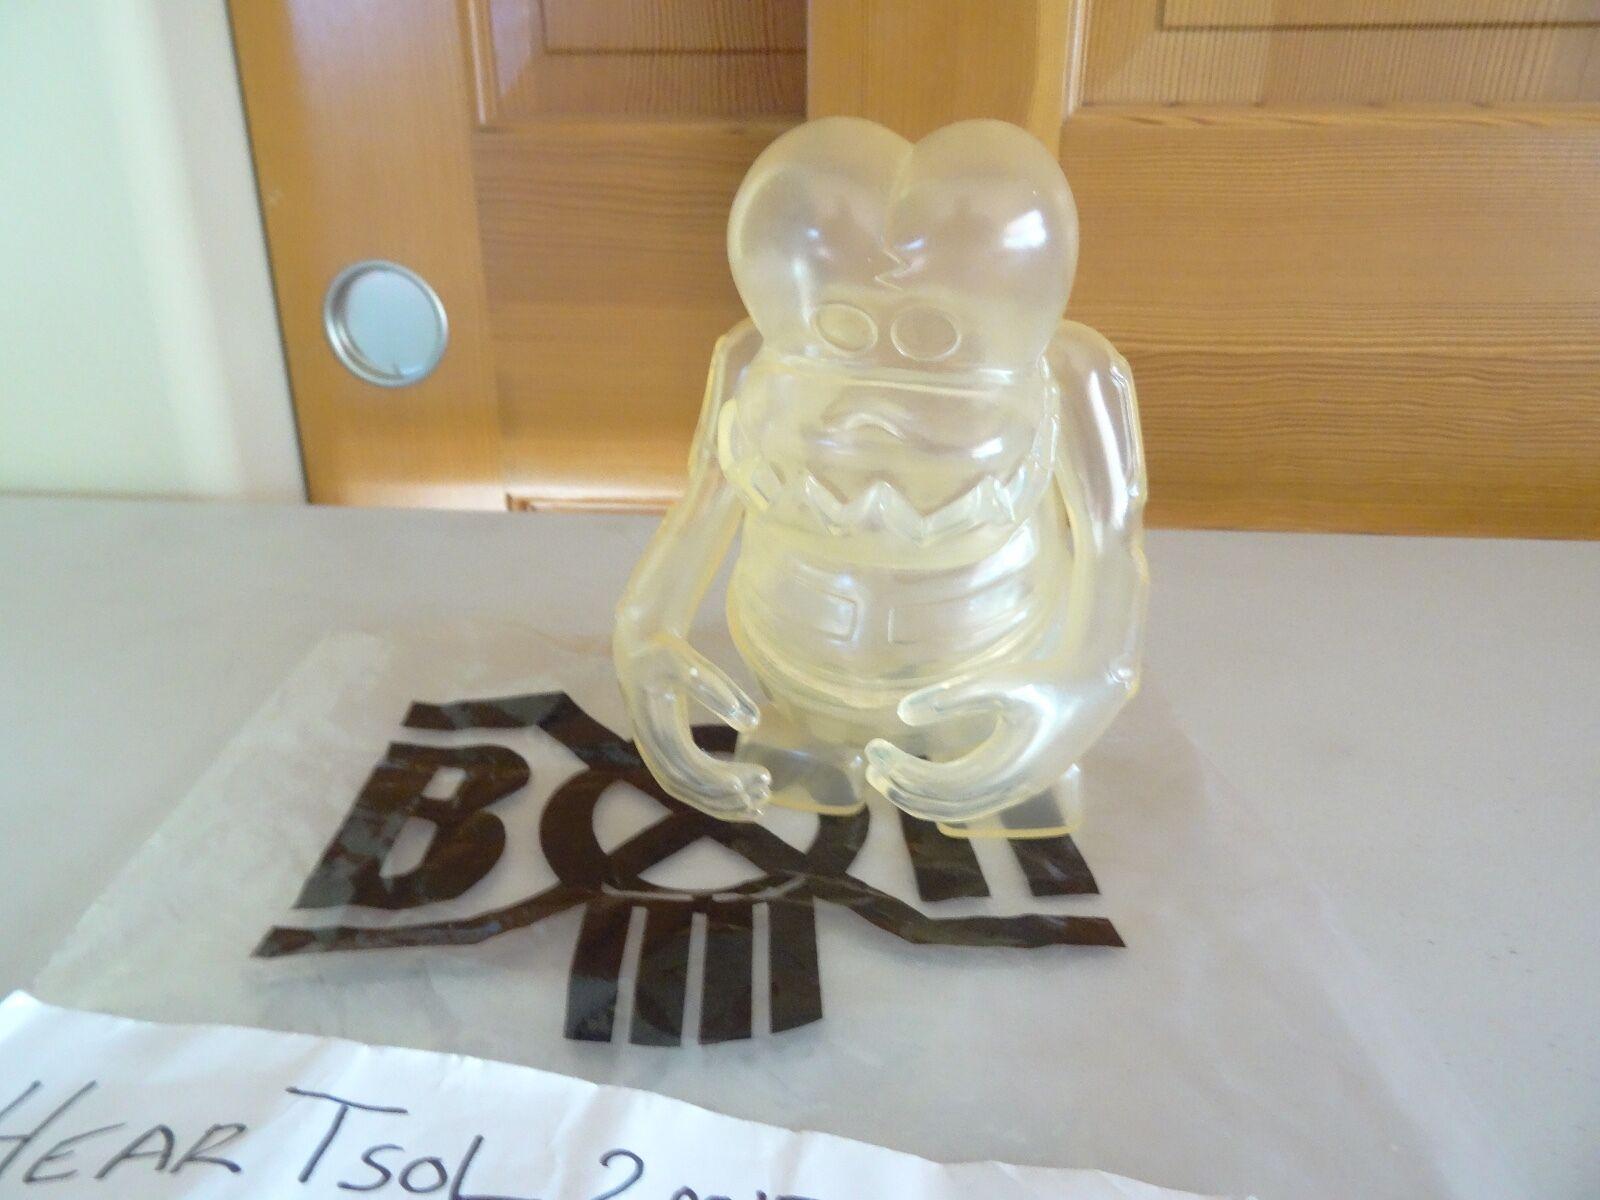 NEW bxh bounty hunter vinyl toy figure Clear Skull KUN - Sofubi - kidrobot KAWS